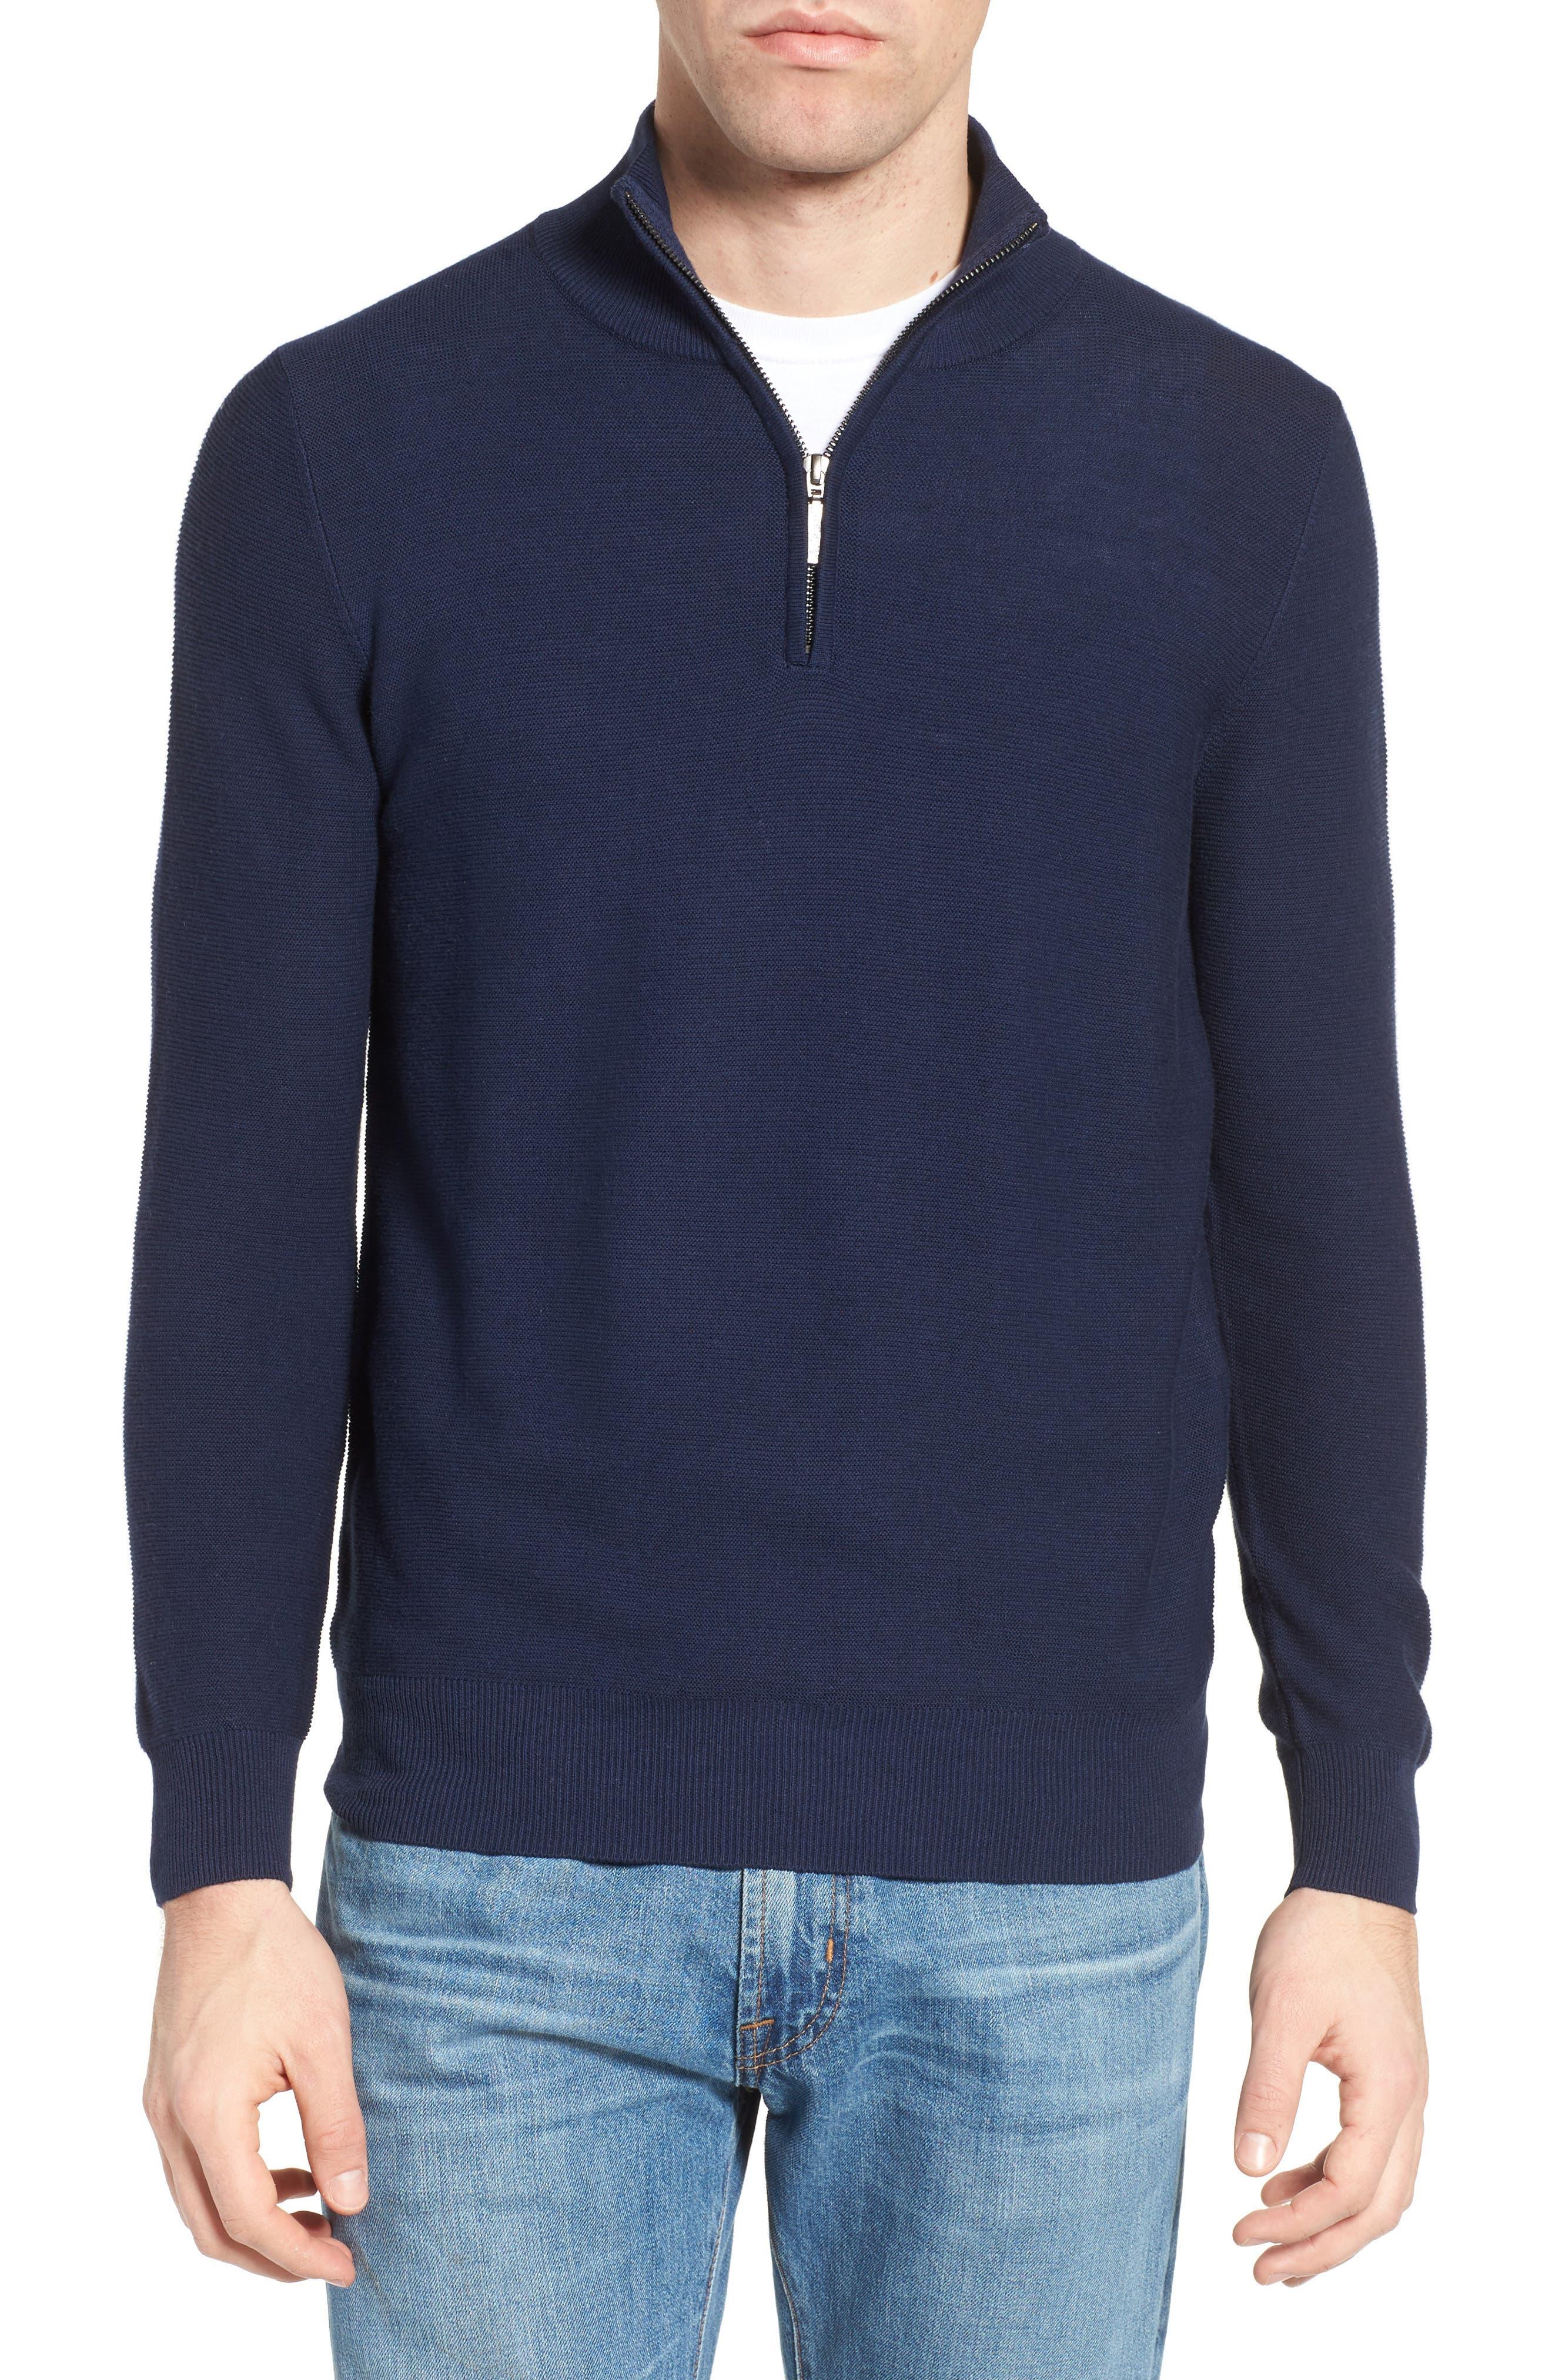 Quarter Zip Sweater,                             Main thumbnail 1, color,                             Navy